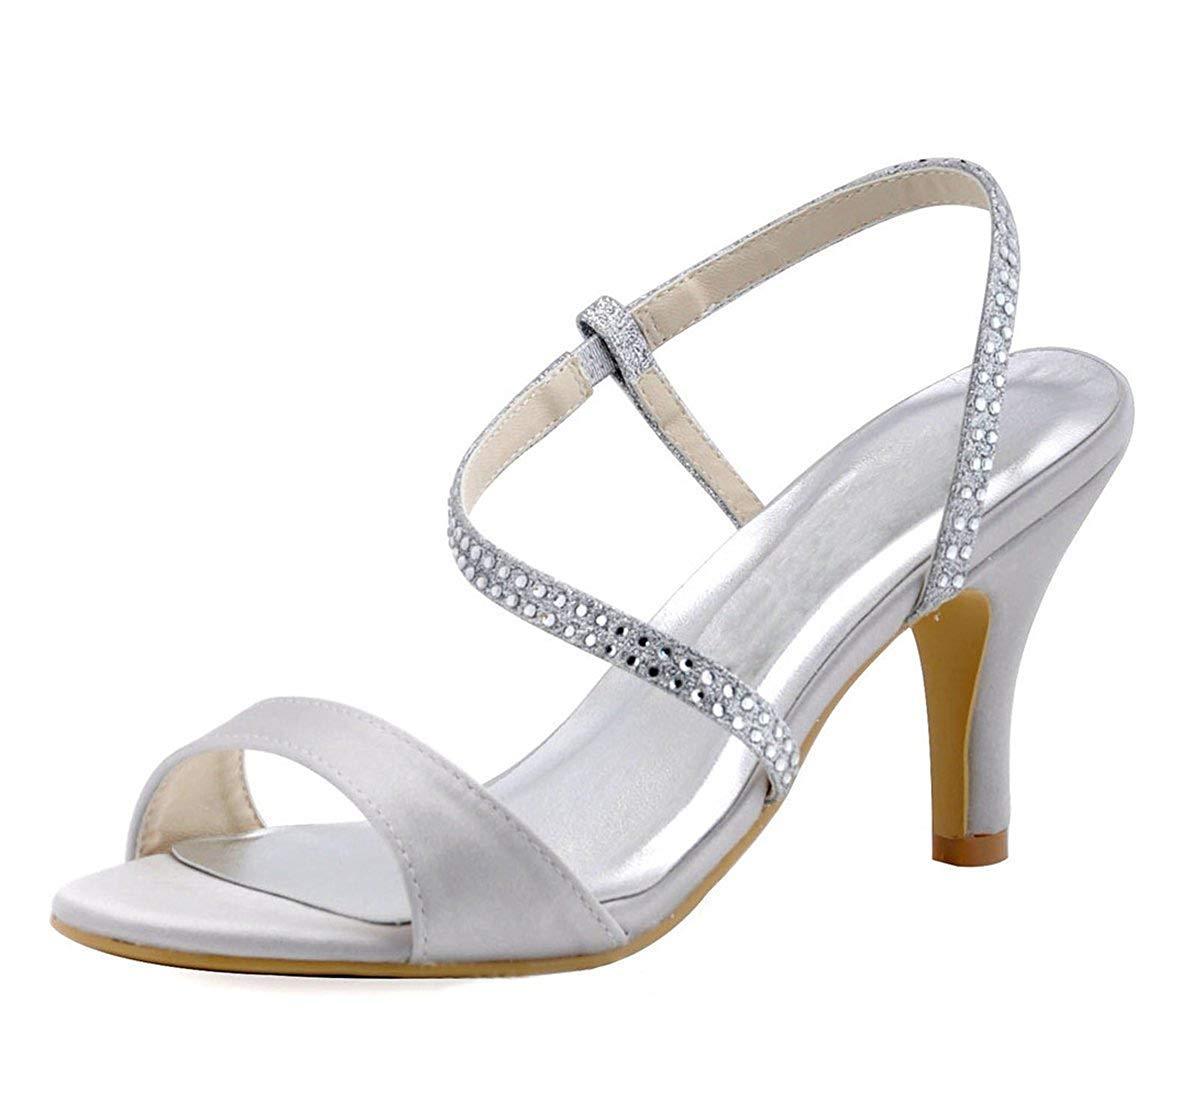 ZHRUI Damen Crystals Ankle Wrap Elfenbein Satin Bridal Bridal Bridal Wedding Dress Sandalen UK 2.5 (Farbe   -, Größe   -) d2ff82